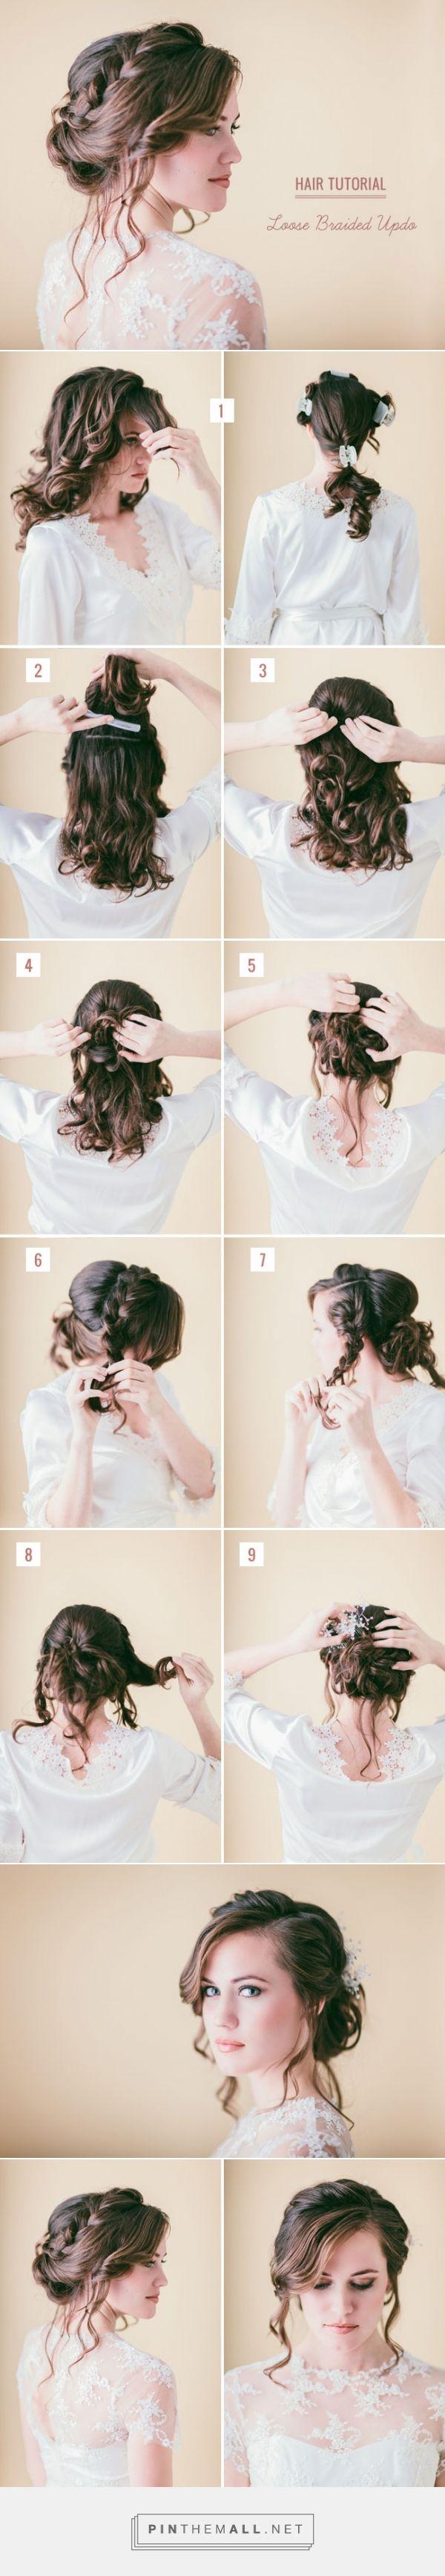 Hair Tutorial: Loose Braided Updo | Green Wedding Shoes Wedding Blog ...